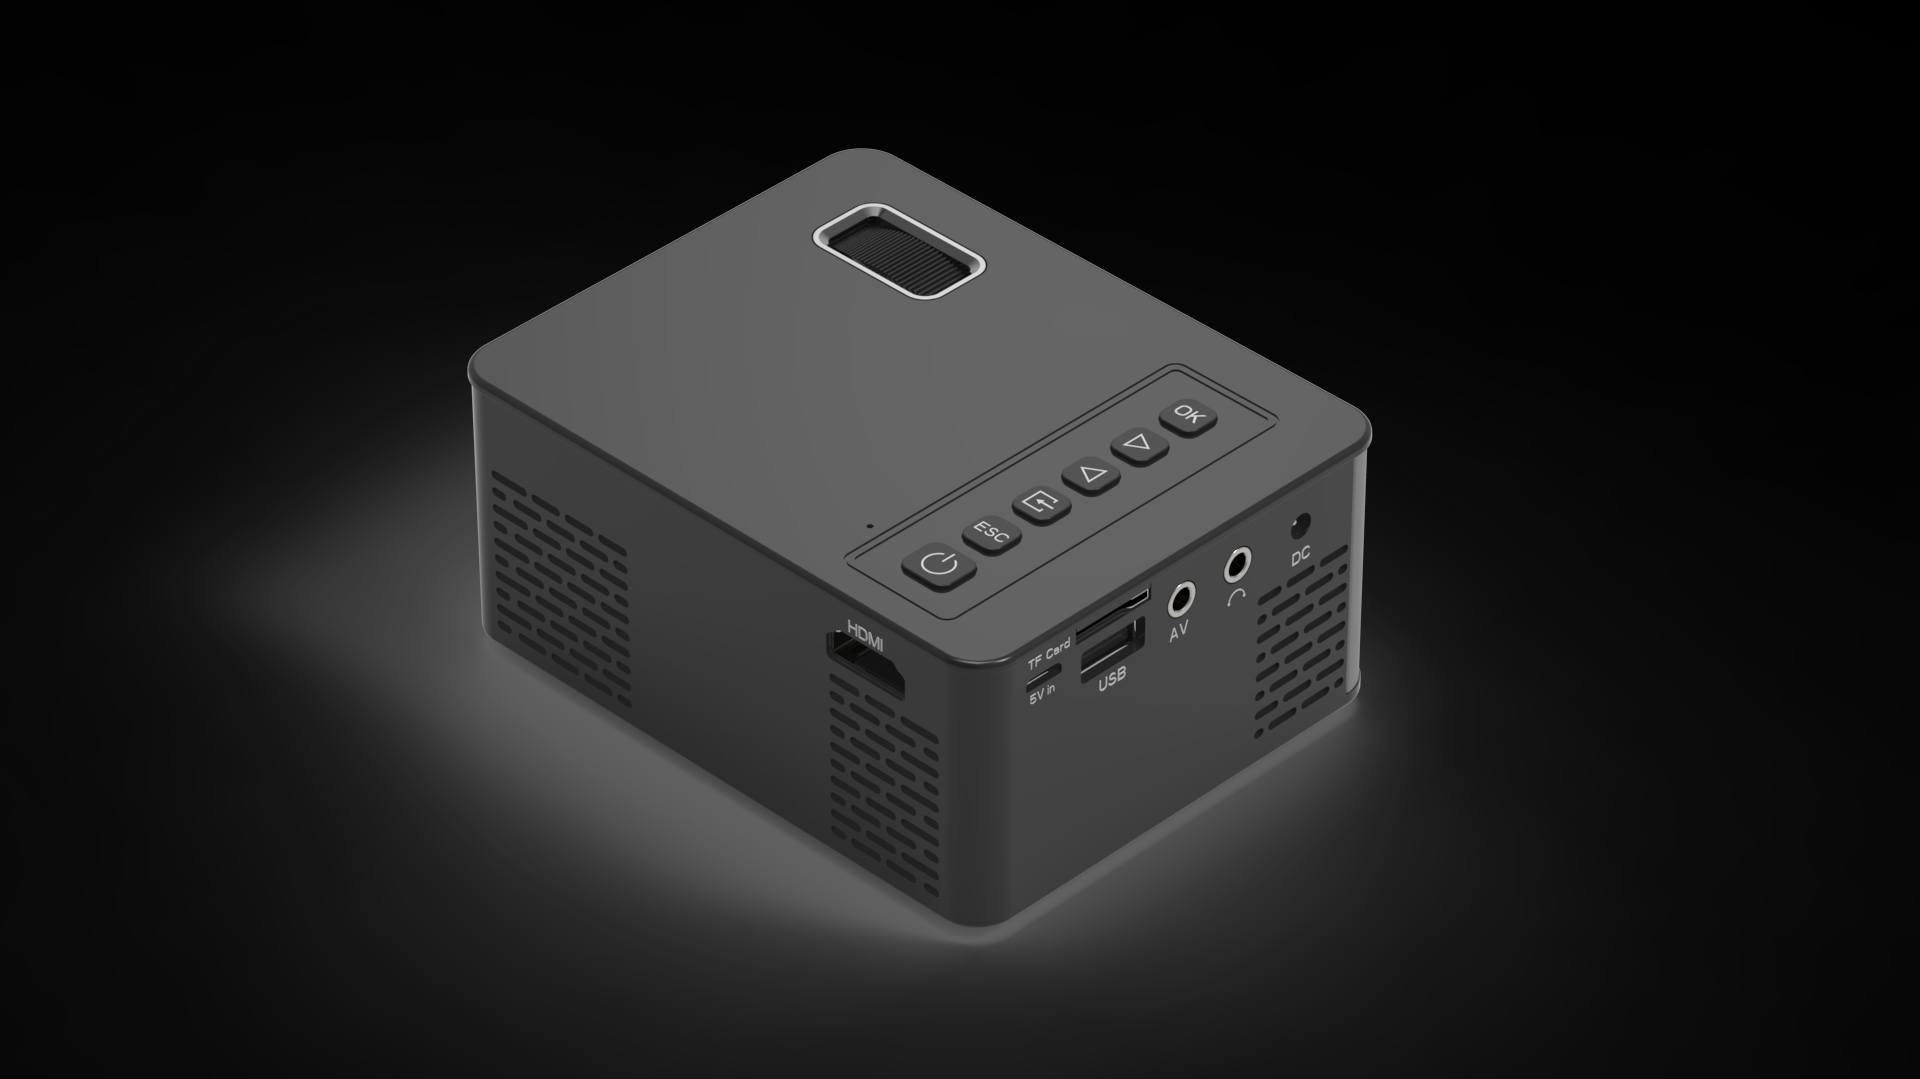 2019 neueste Mini Projektor 1280*720P Unterstützung 4K Videos Über HDMI Home Cinema Film FÜHRTE Projektor Portable projektor Video